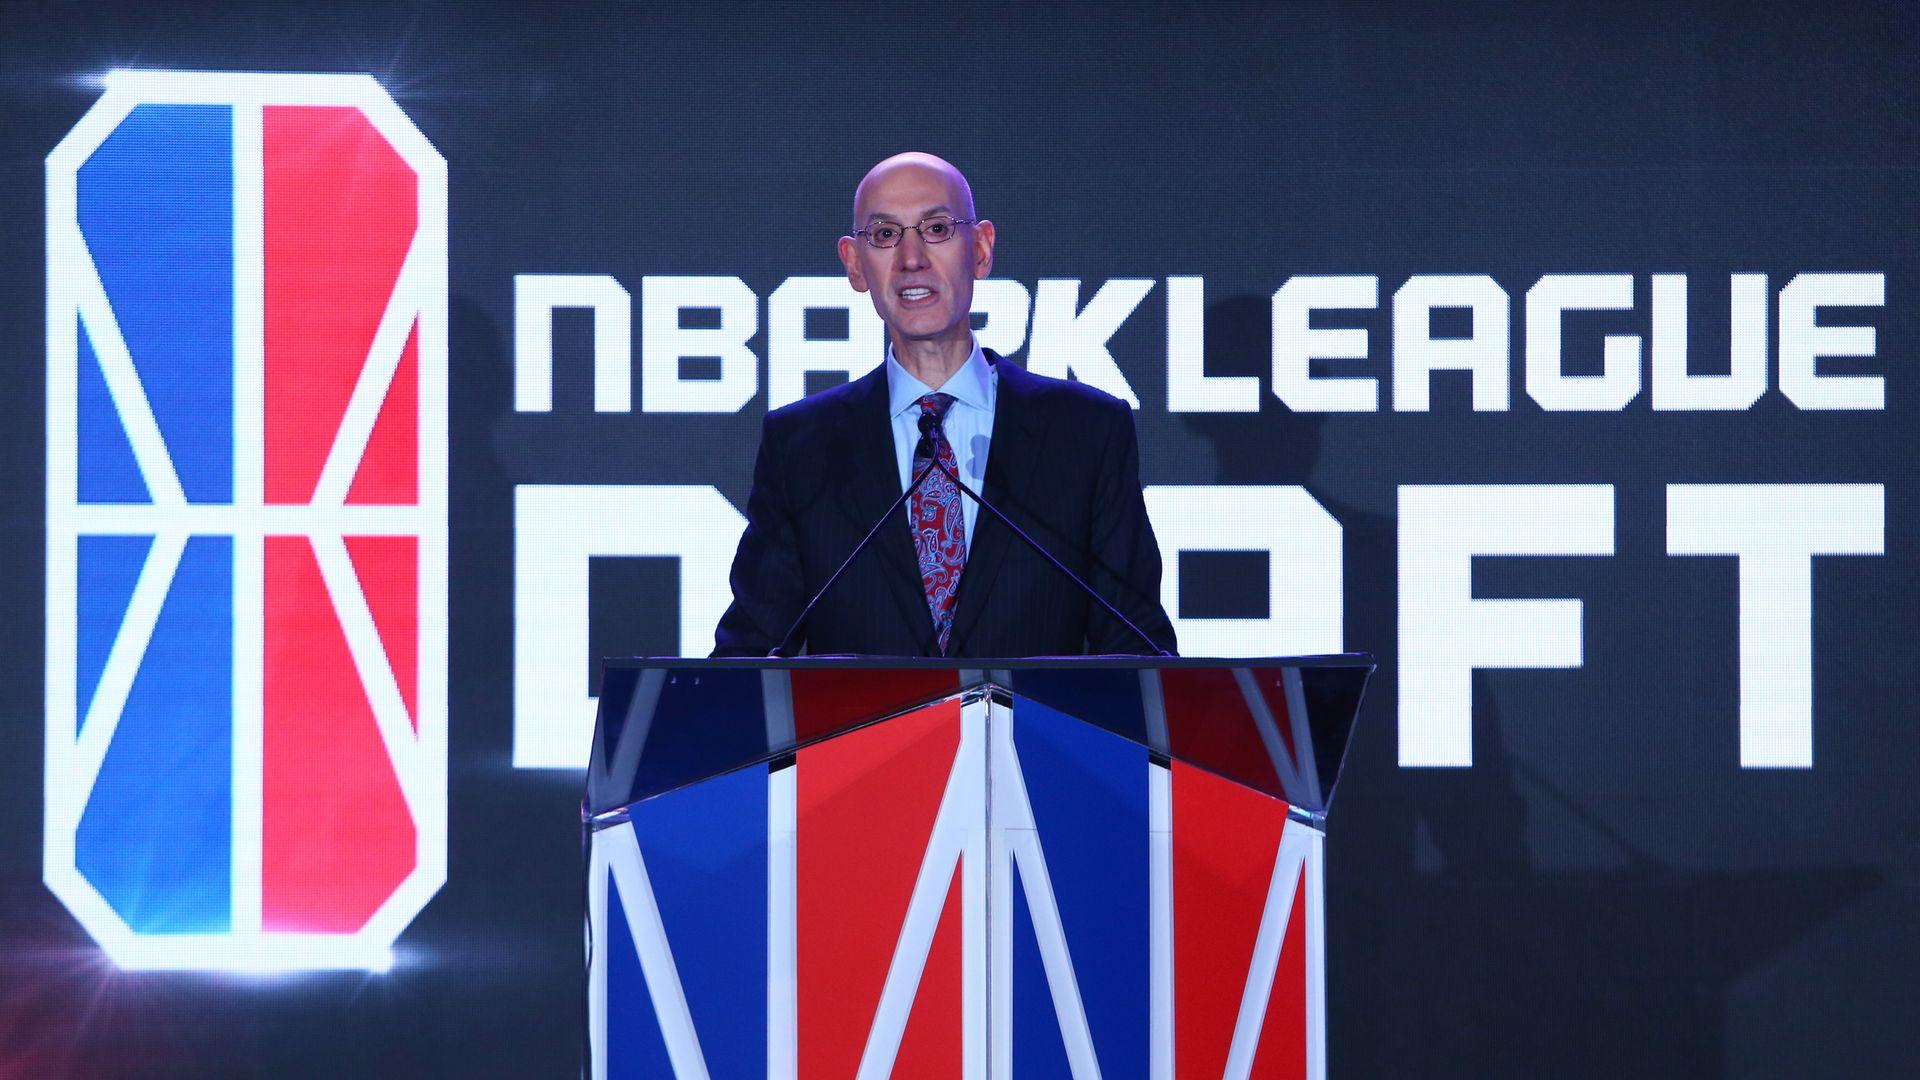 NBA Commissioner Adam Silver at the NBA 2k league draft